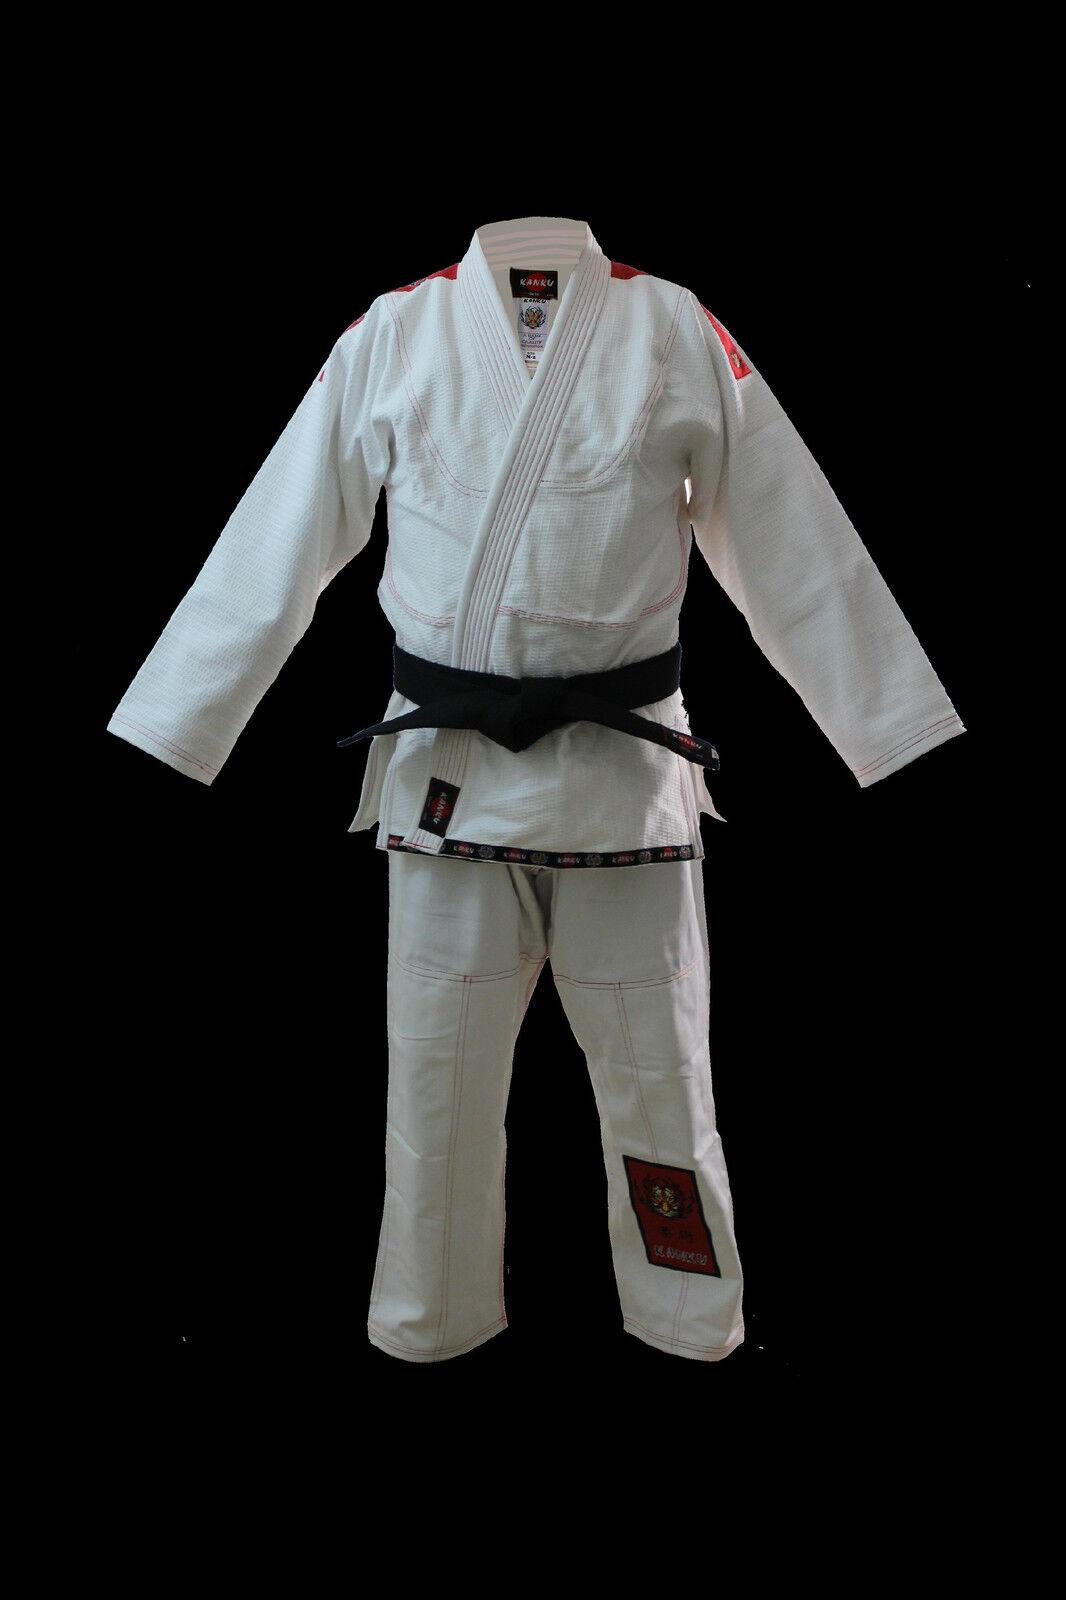 KANKU White Jiu jitsu Gi uniform, Bjj Uniform,  550 gram gold Weave MMA Aikido  best offer